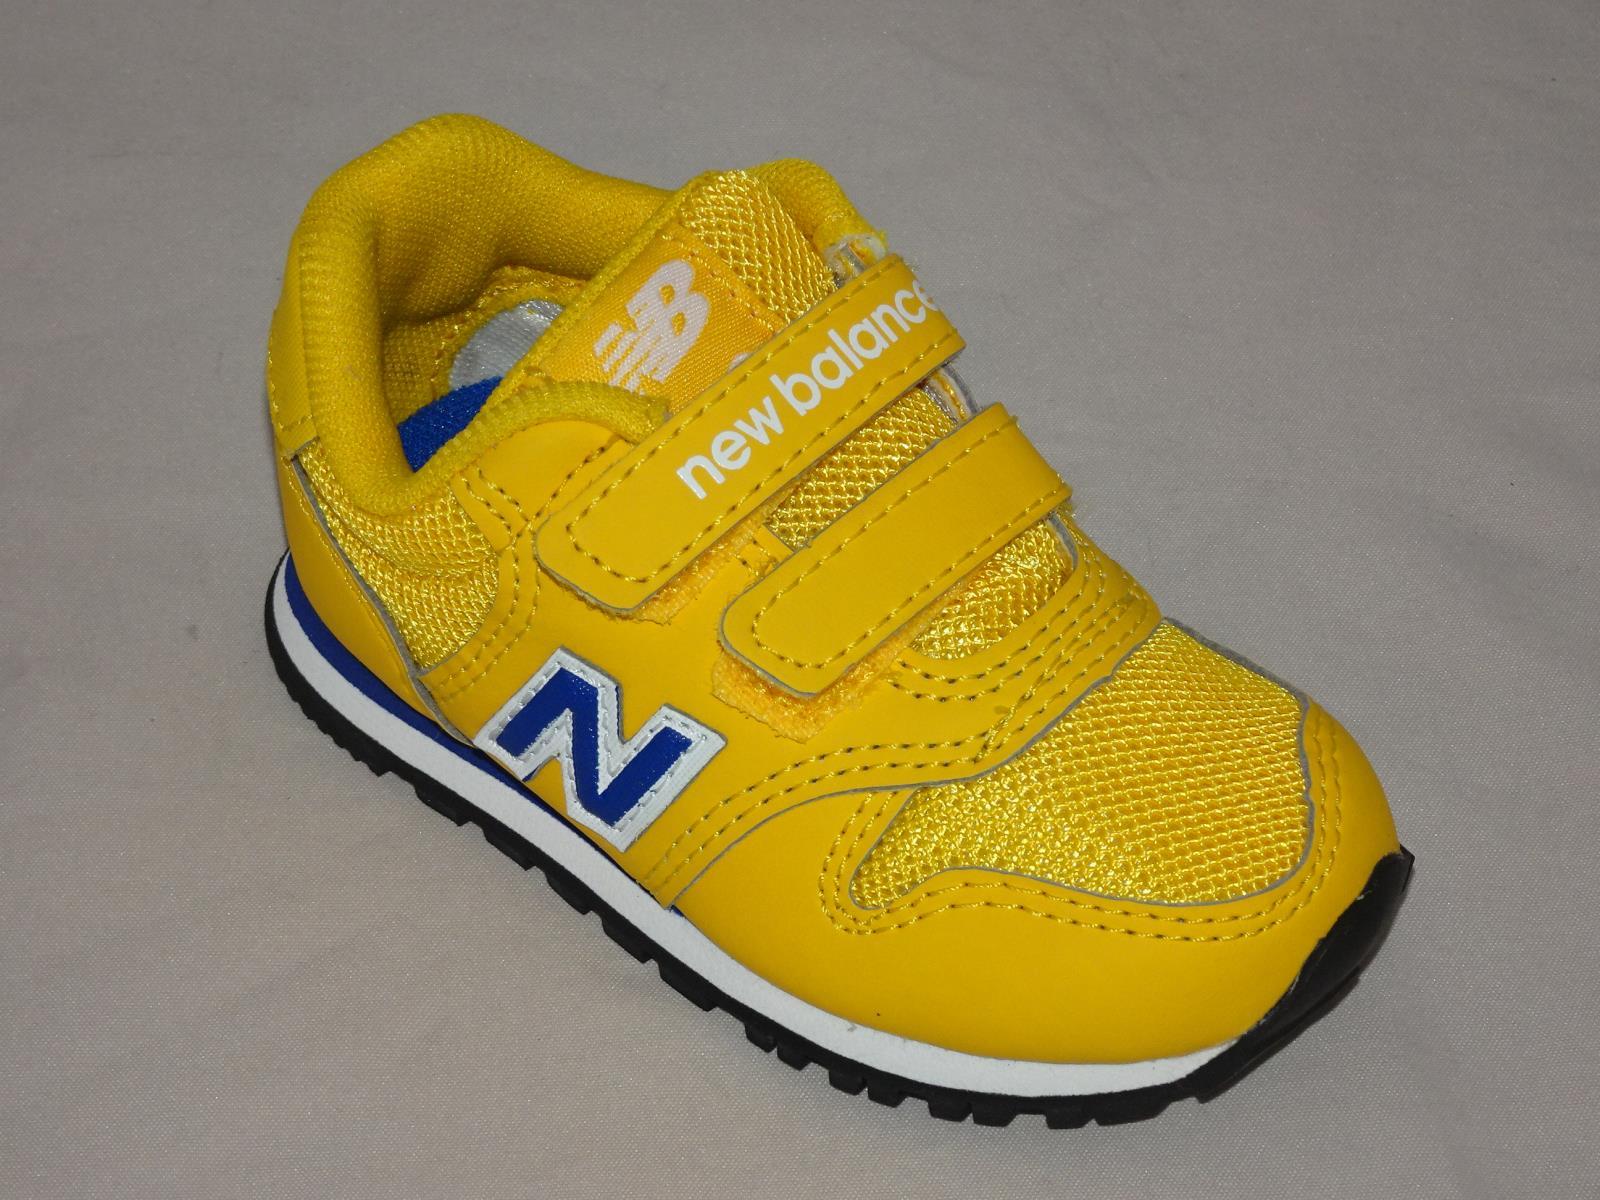 NEW BALANCE sneaker new balance kv500yli